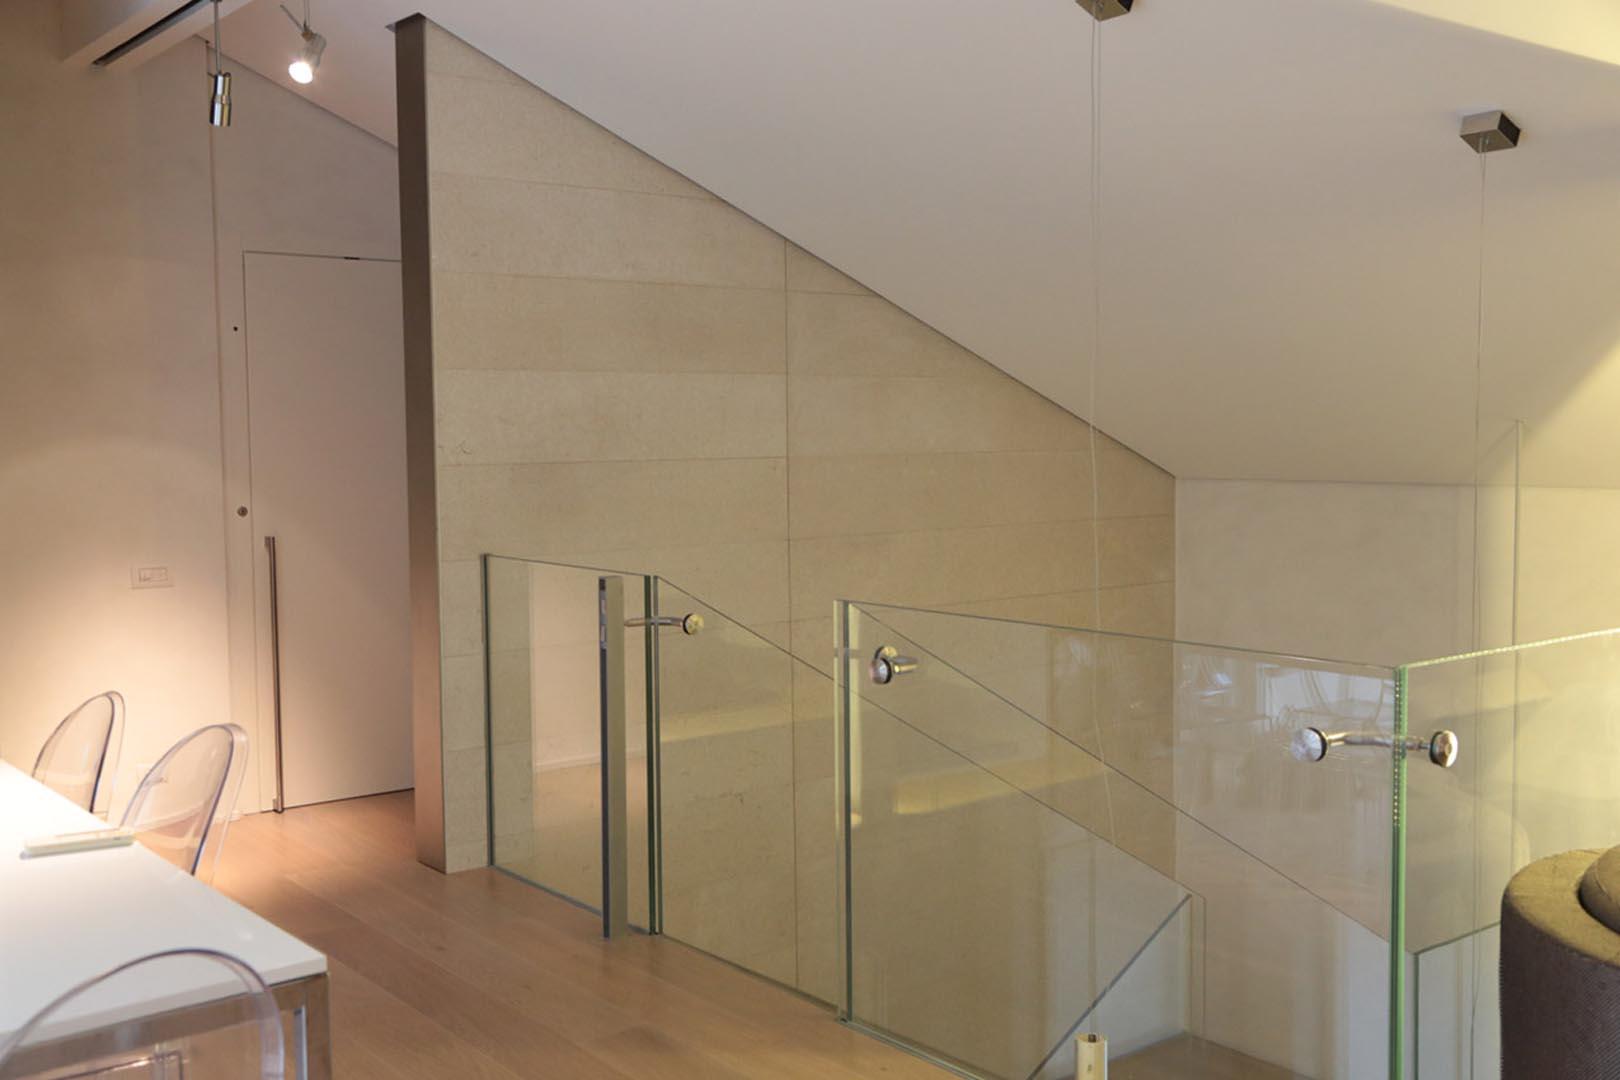 Villa-Parma-rivestimento-pareti-interne-05